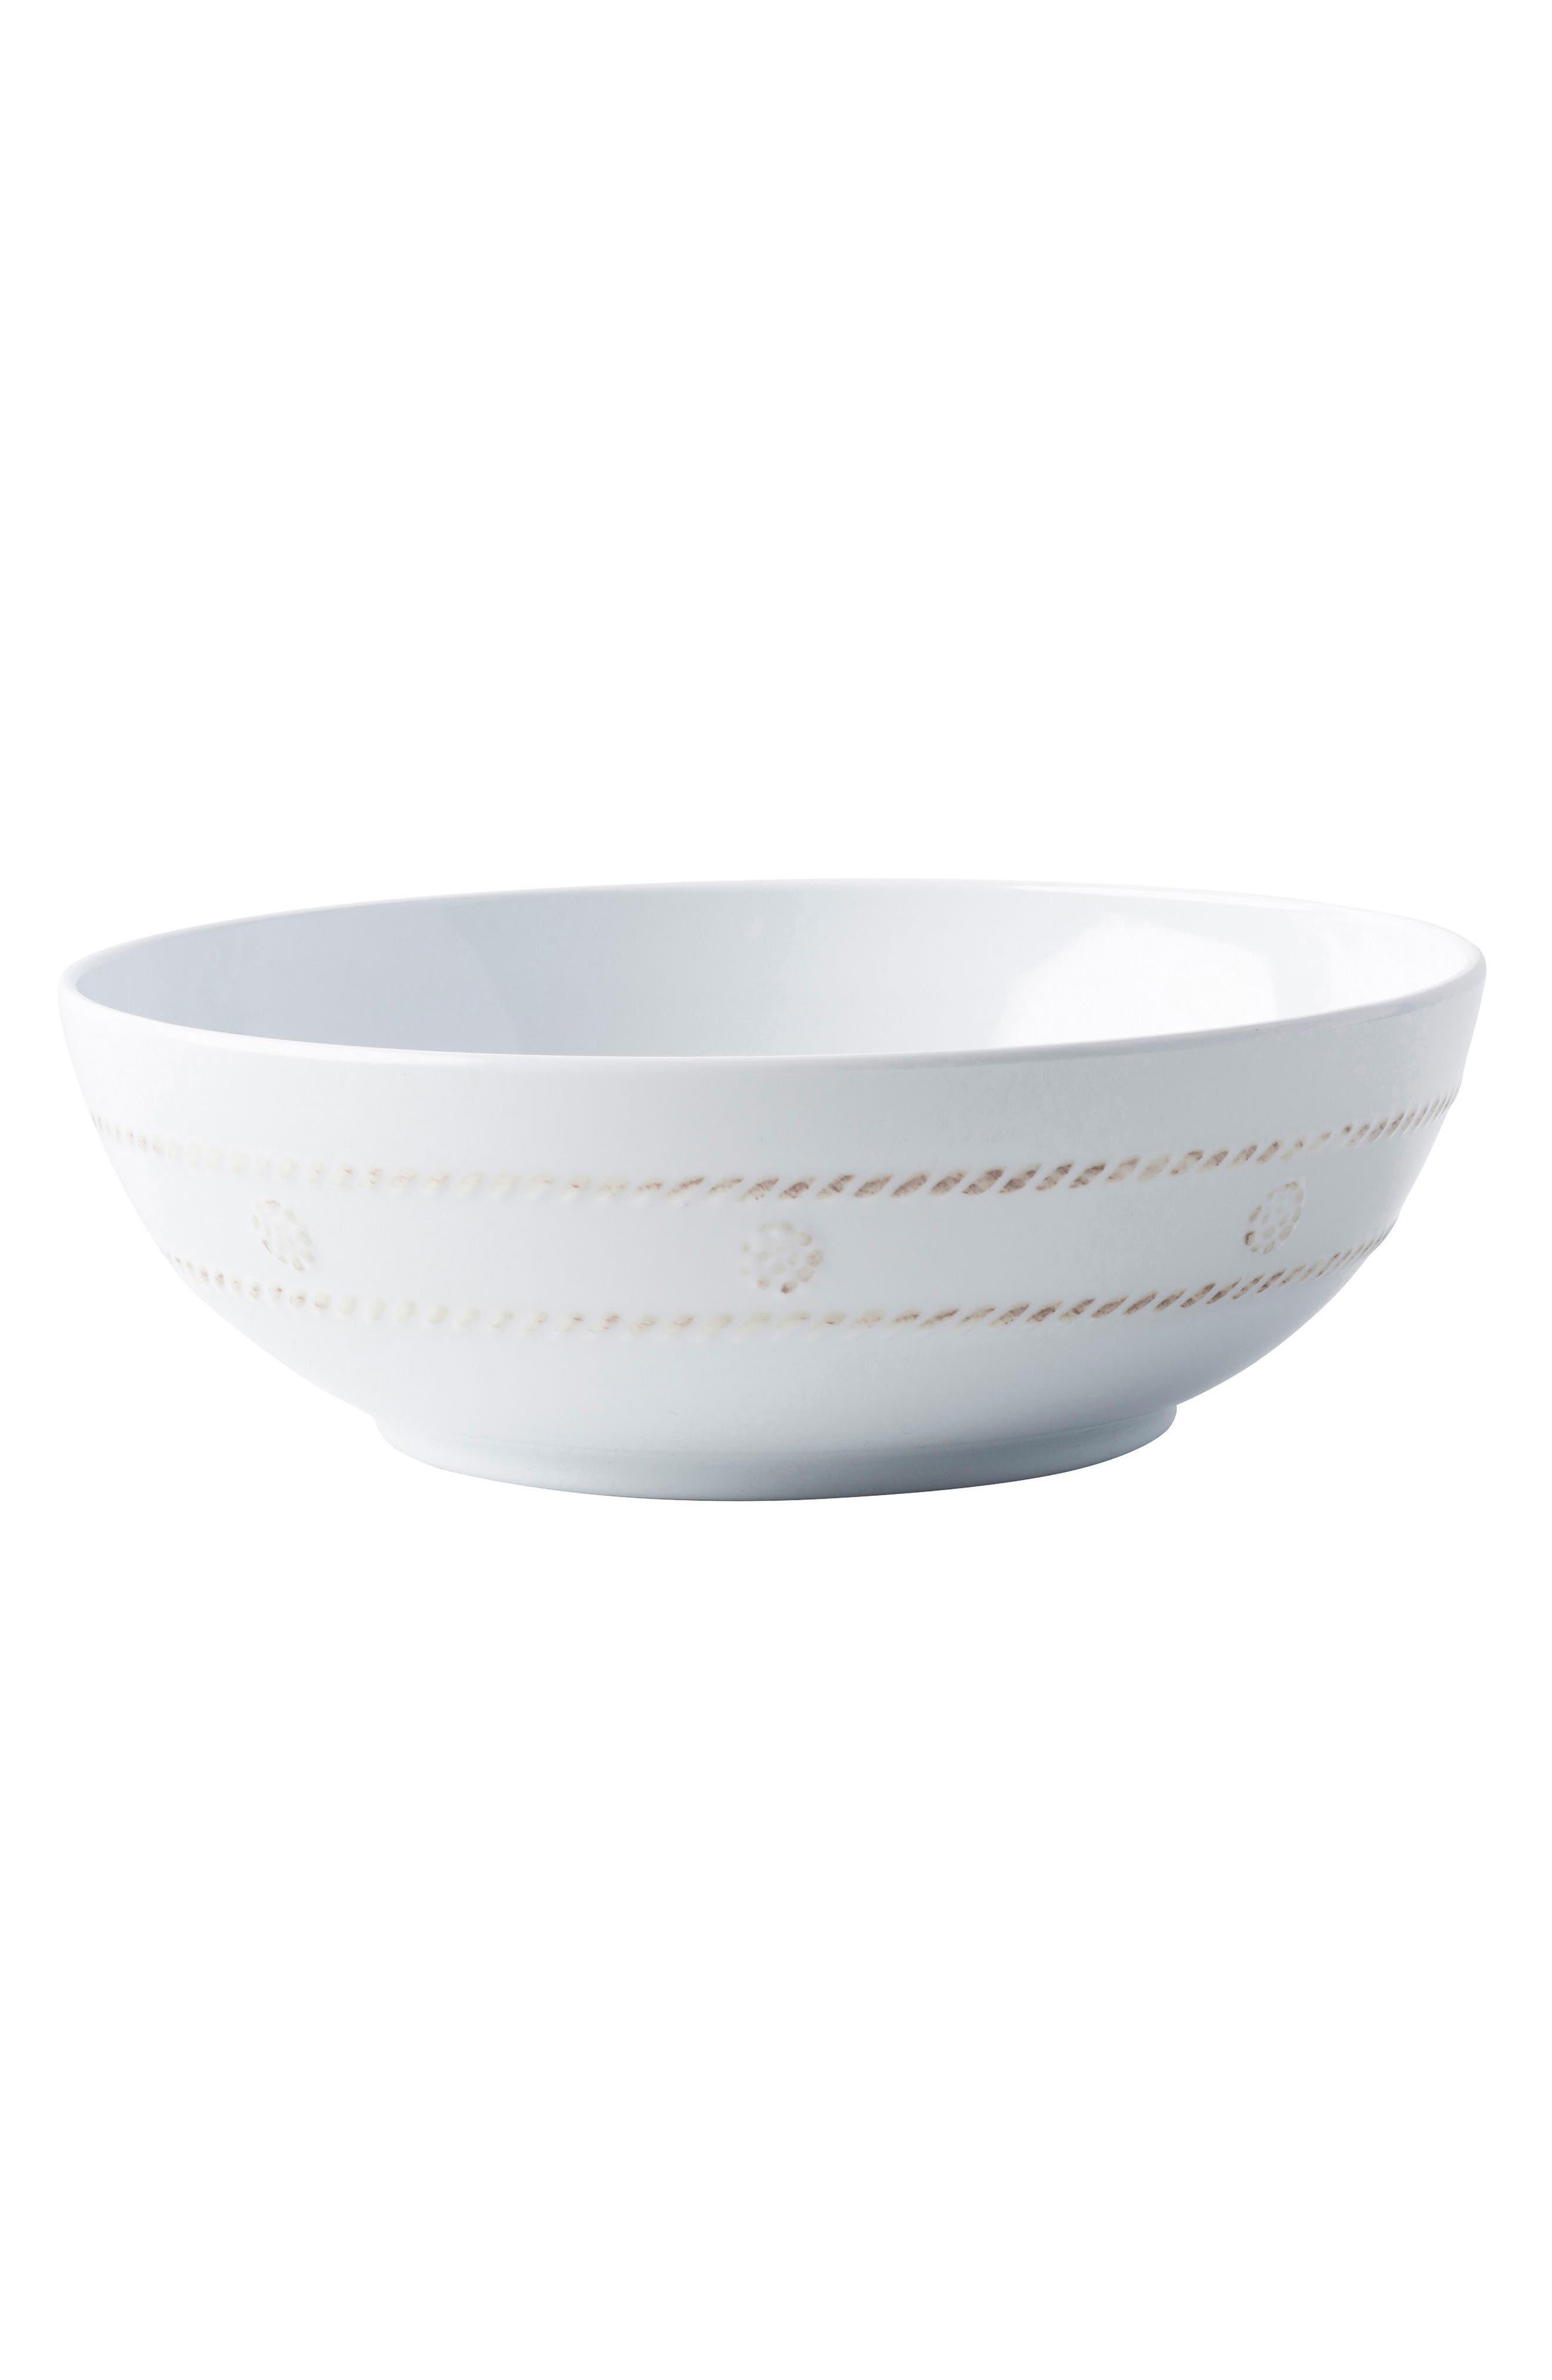 Juliska Berry & Thread Melamine Coupe Bowl